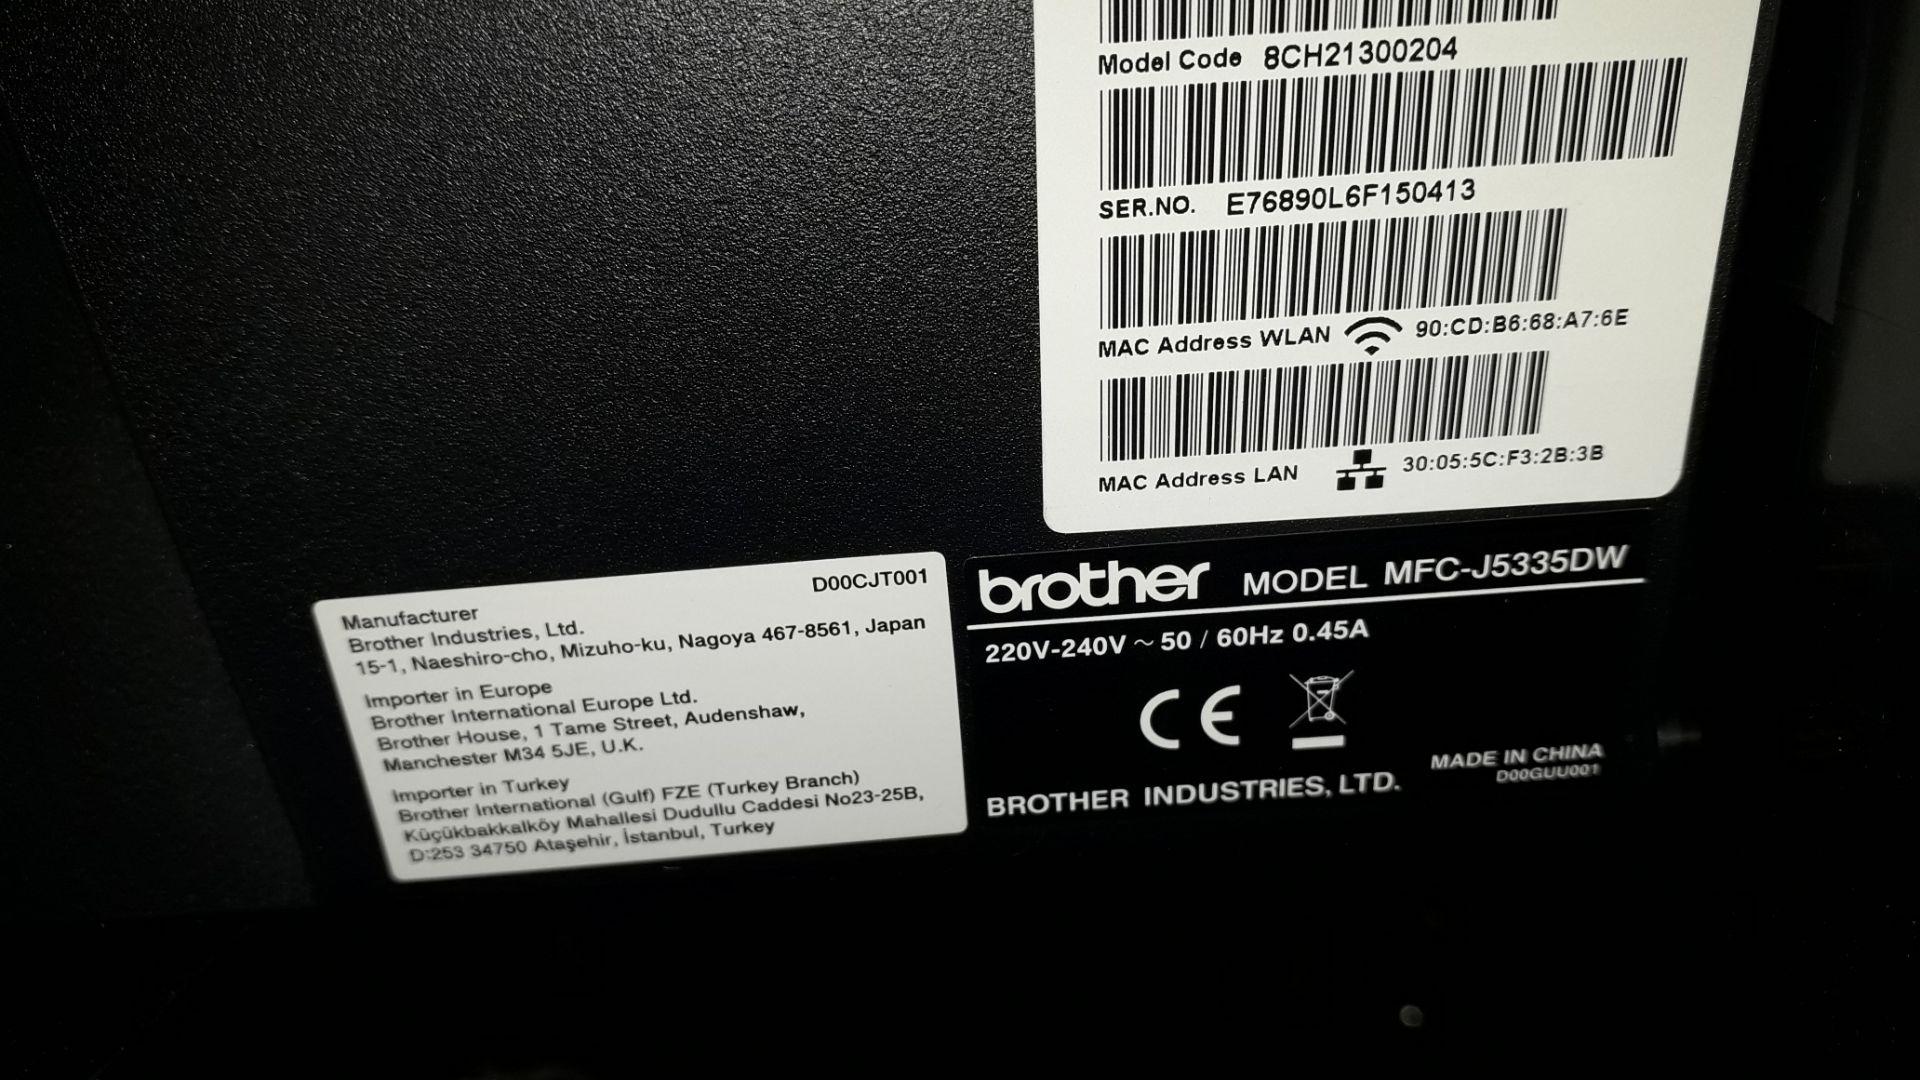 Brother MFCJ5335DW A3 Inkjet Printer Serial Number - Image 2 of 4